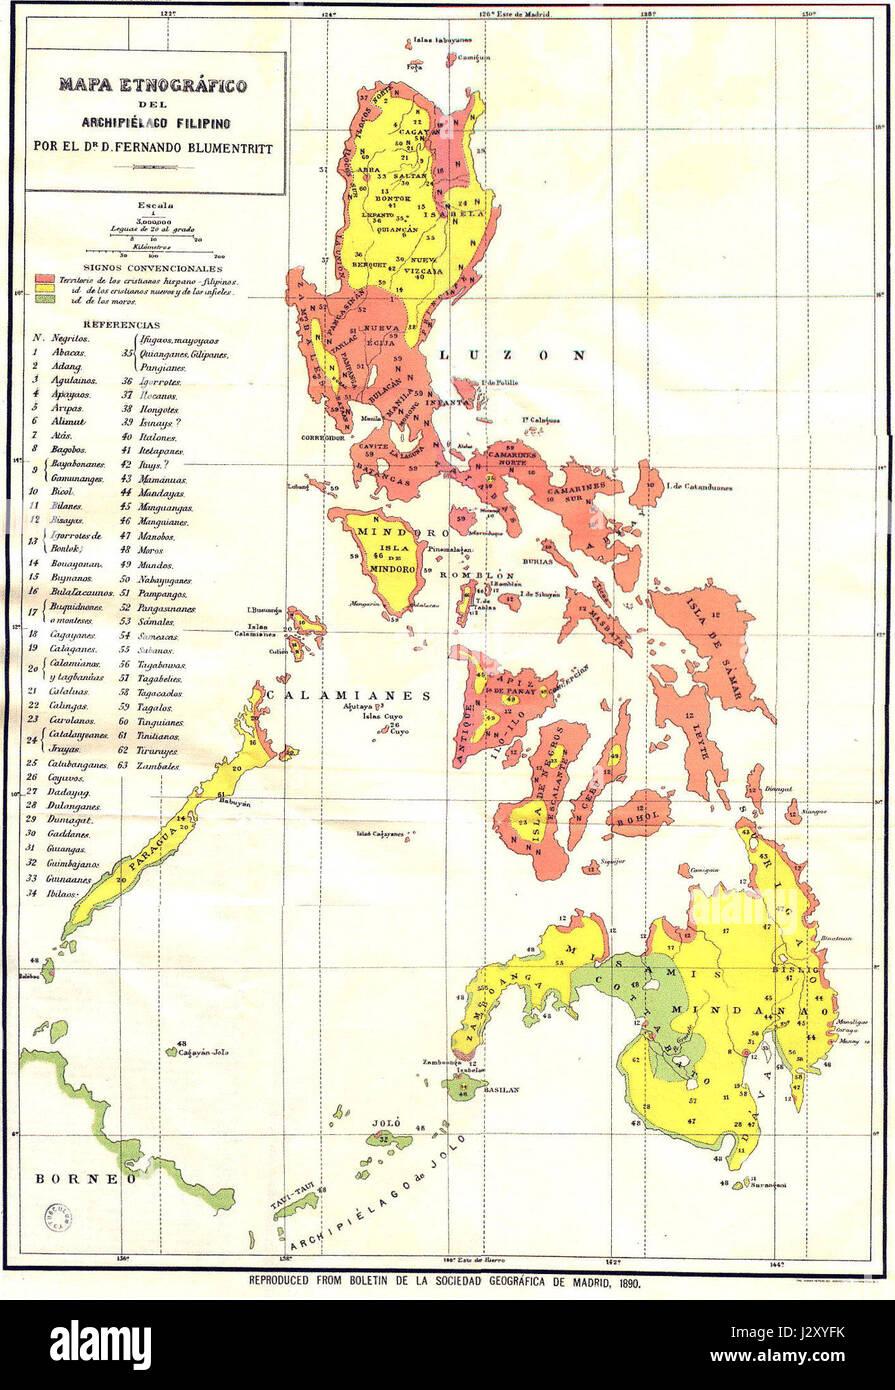 Blumentritt  Ethnographic map of the Philippines 1890 Stock